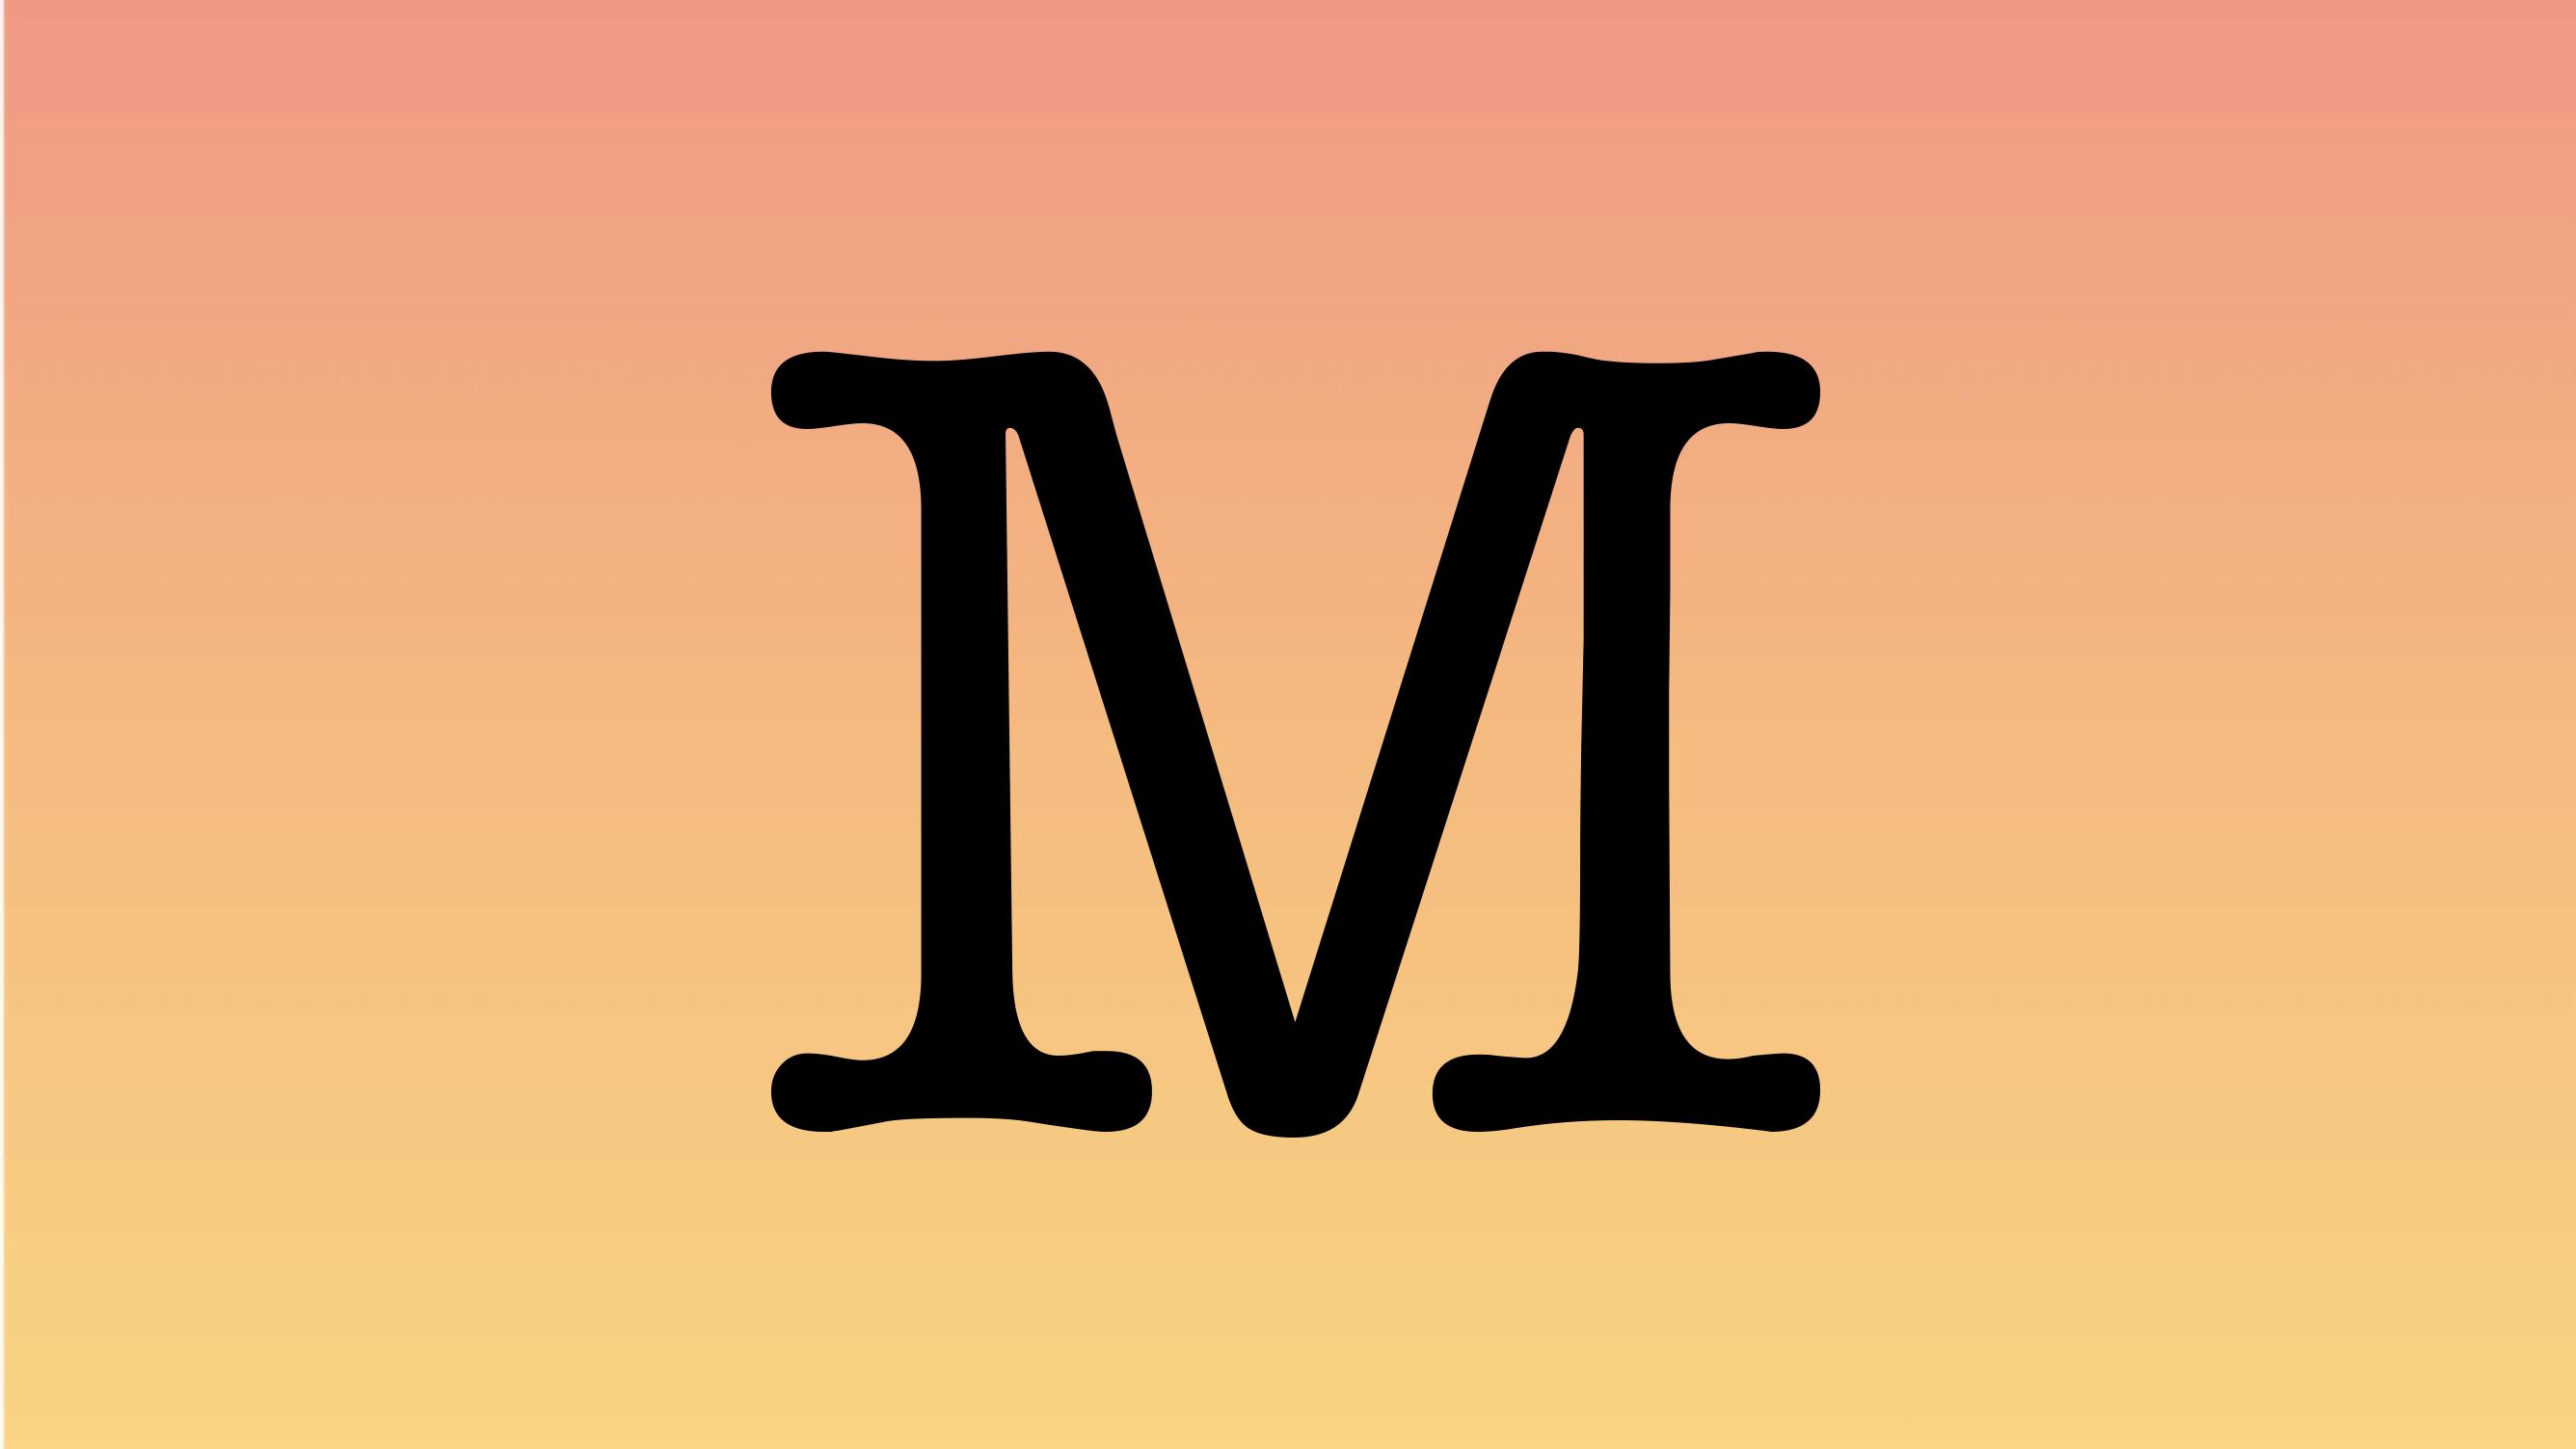 Mから始まる英語のサッカー用語【単語 & フレーズ】